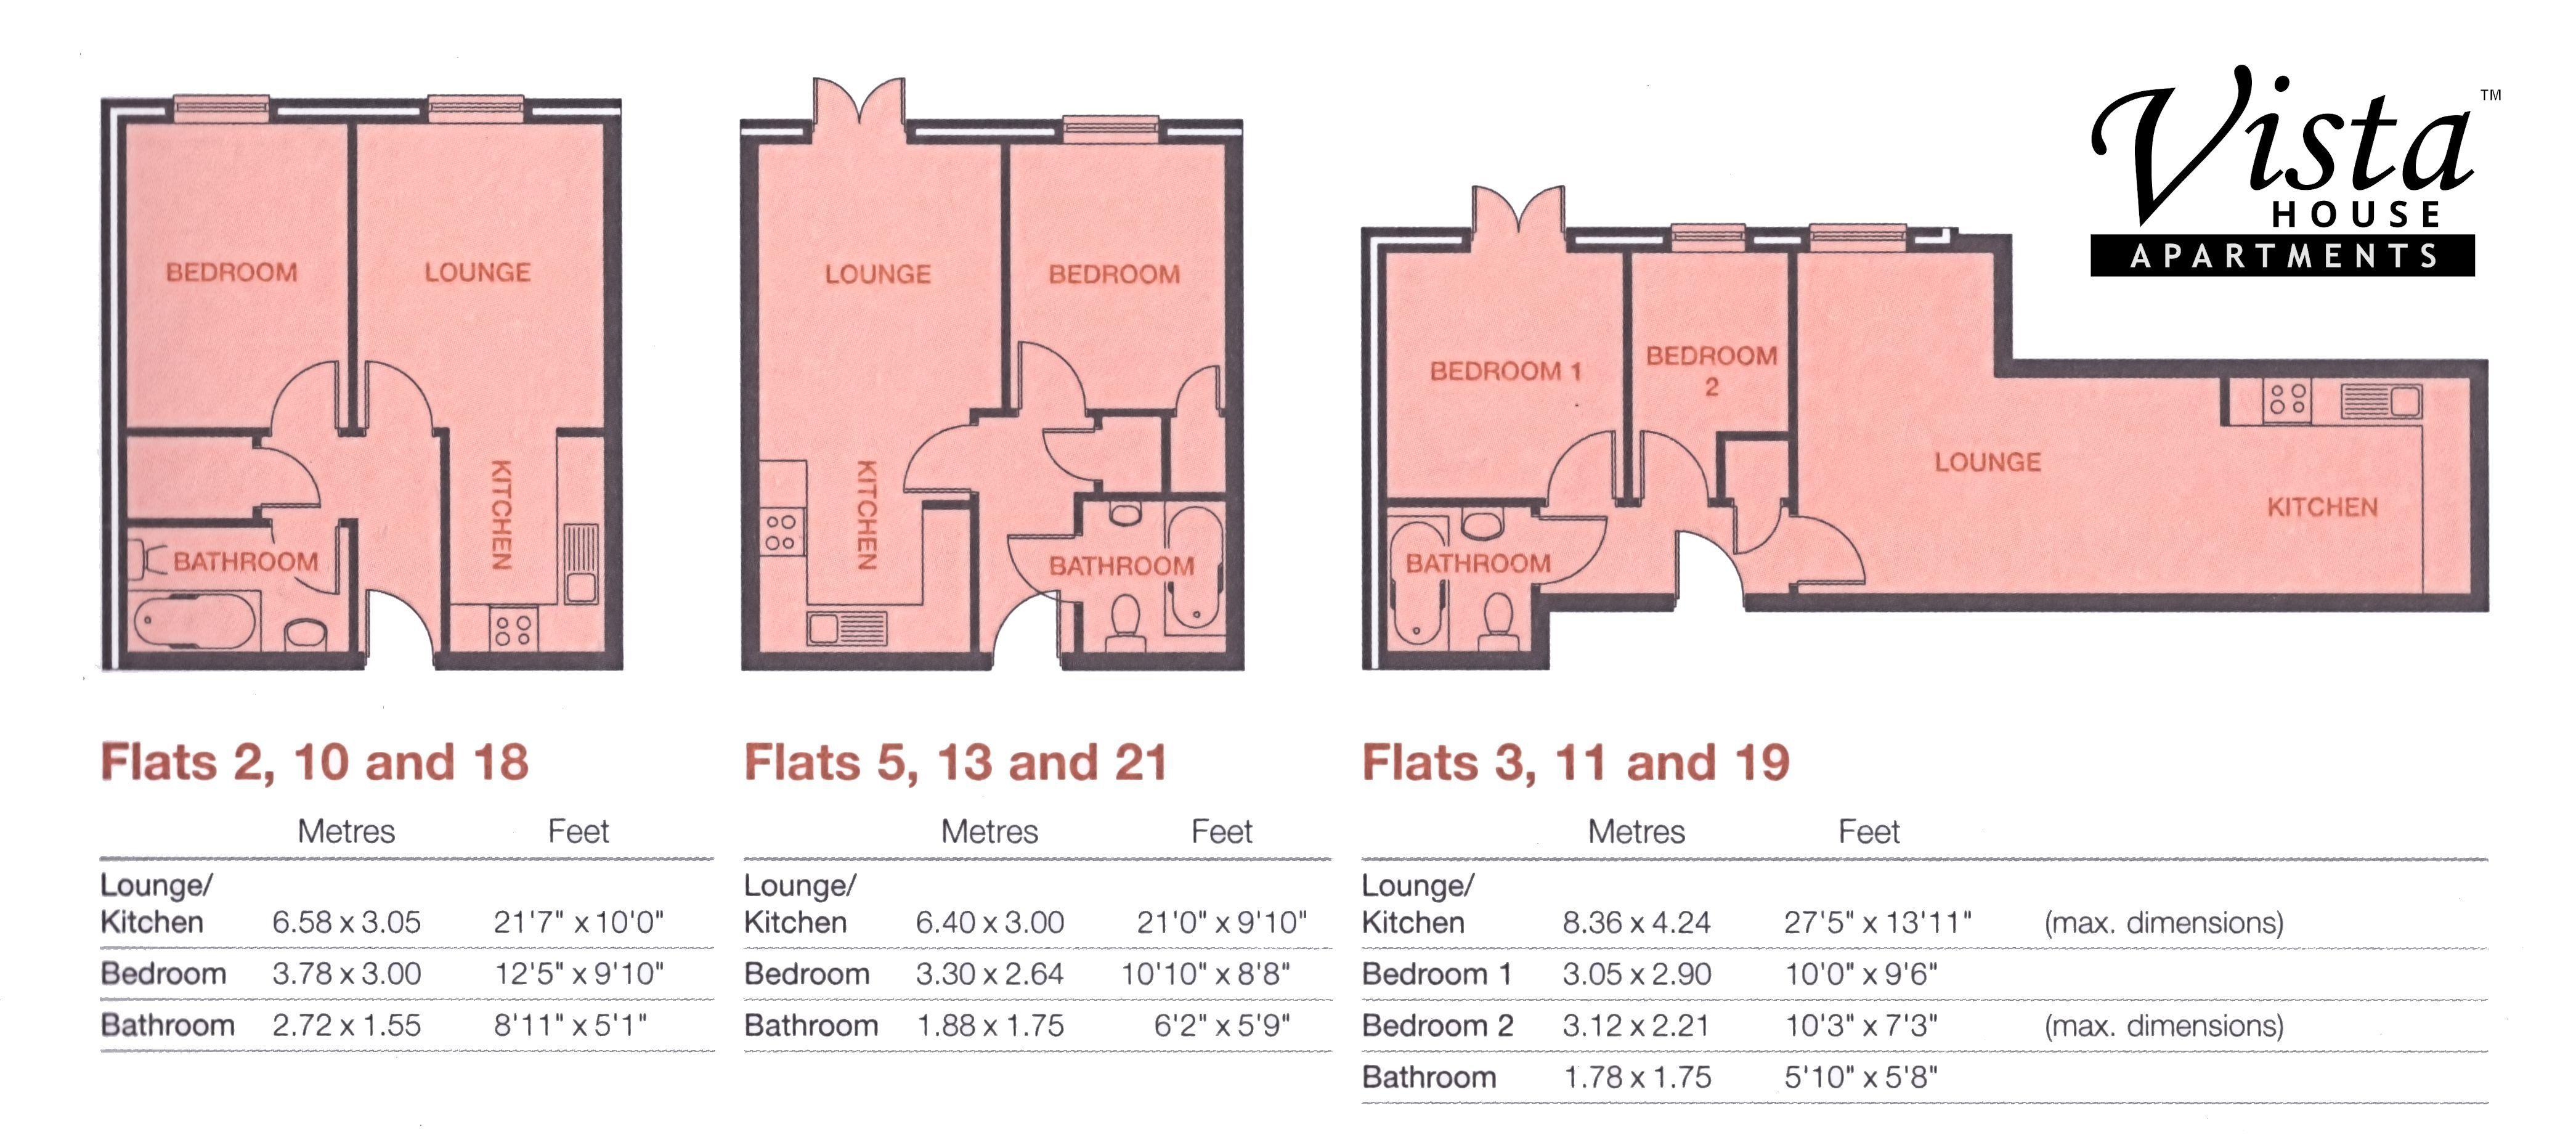 Student Dormitory Floor Plans   Google 검색  Floor Plans For Apartments